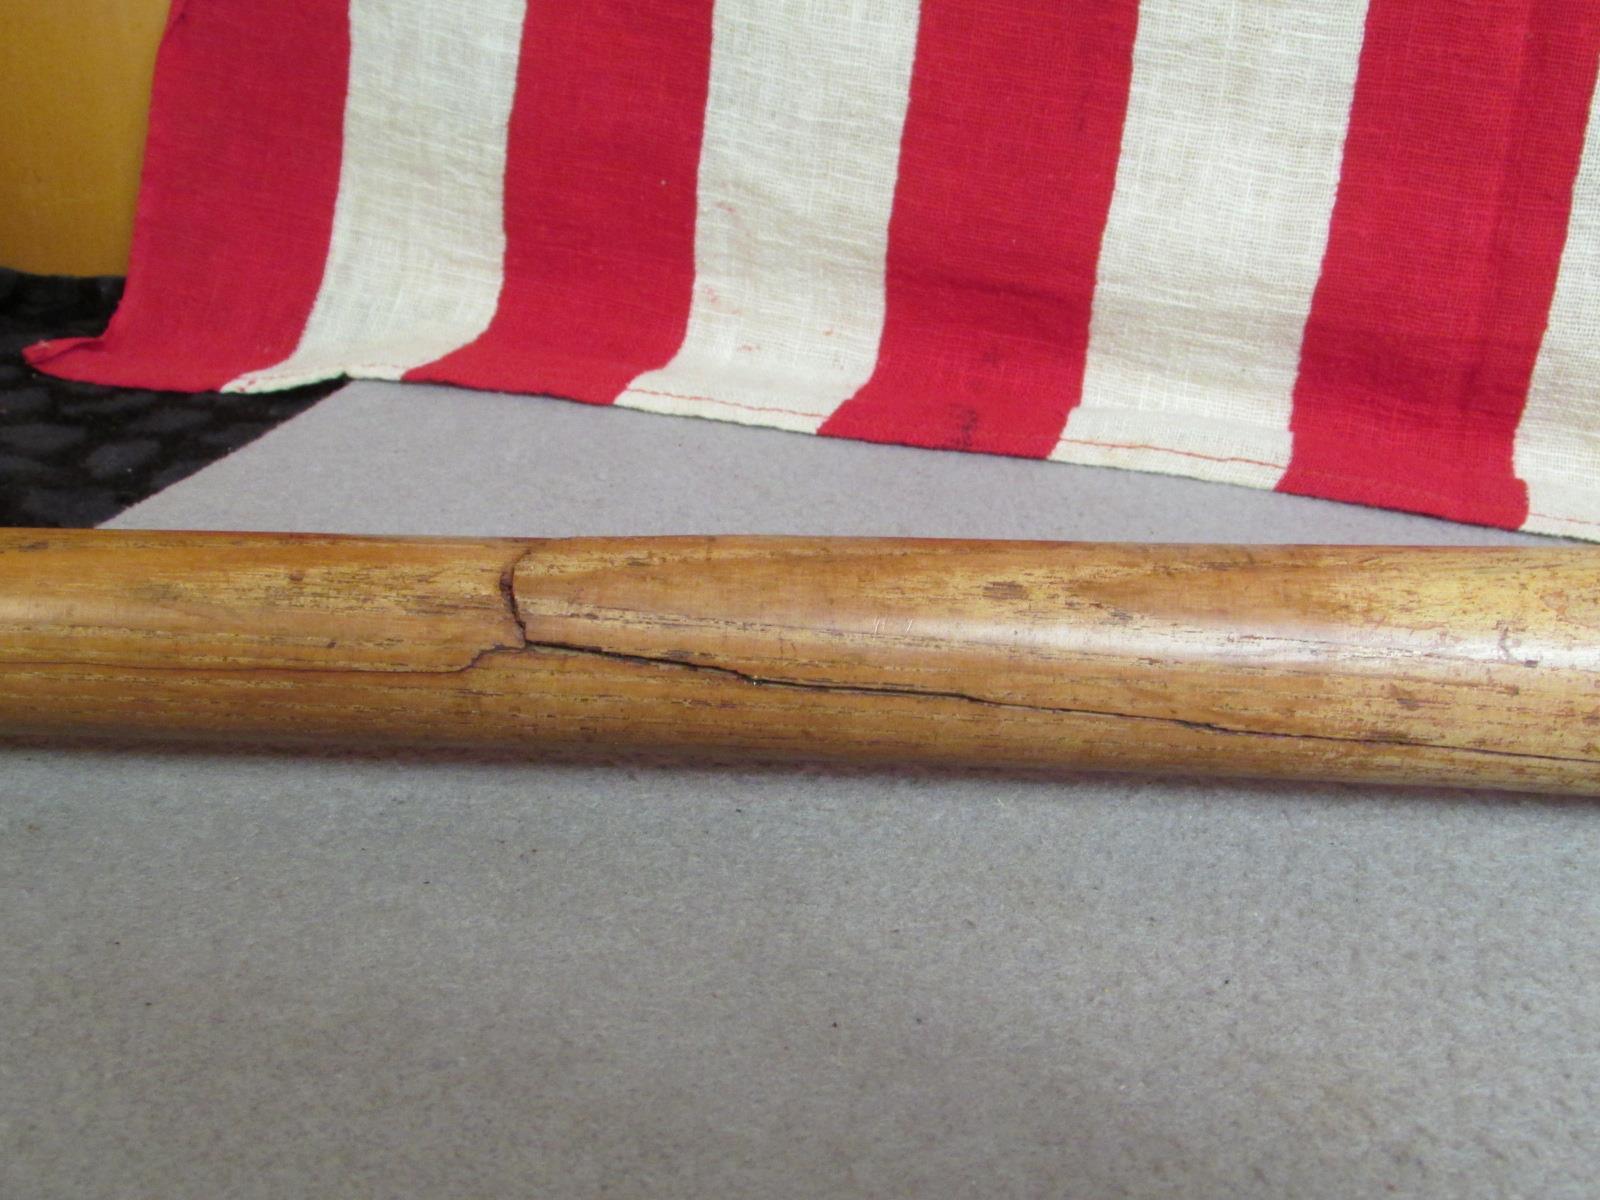 Vintage Adirondack Holz Baseball Schläger 302J 302J 302J Esche Gil Hodges Little League 37f6dc